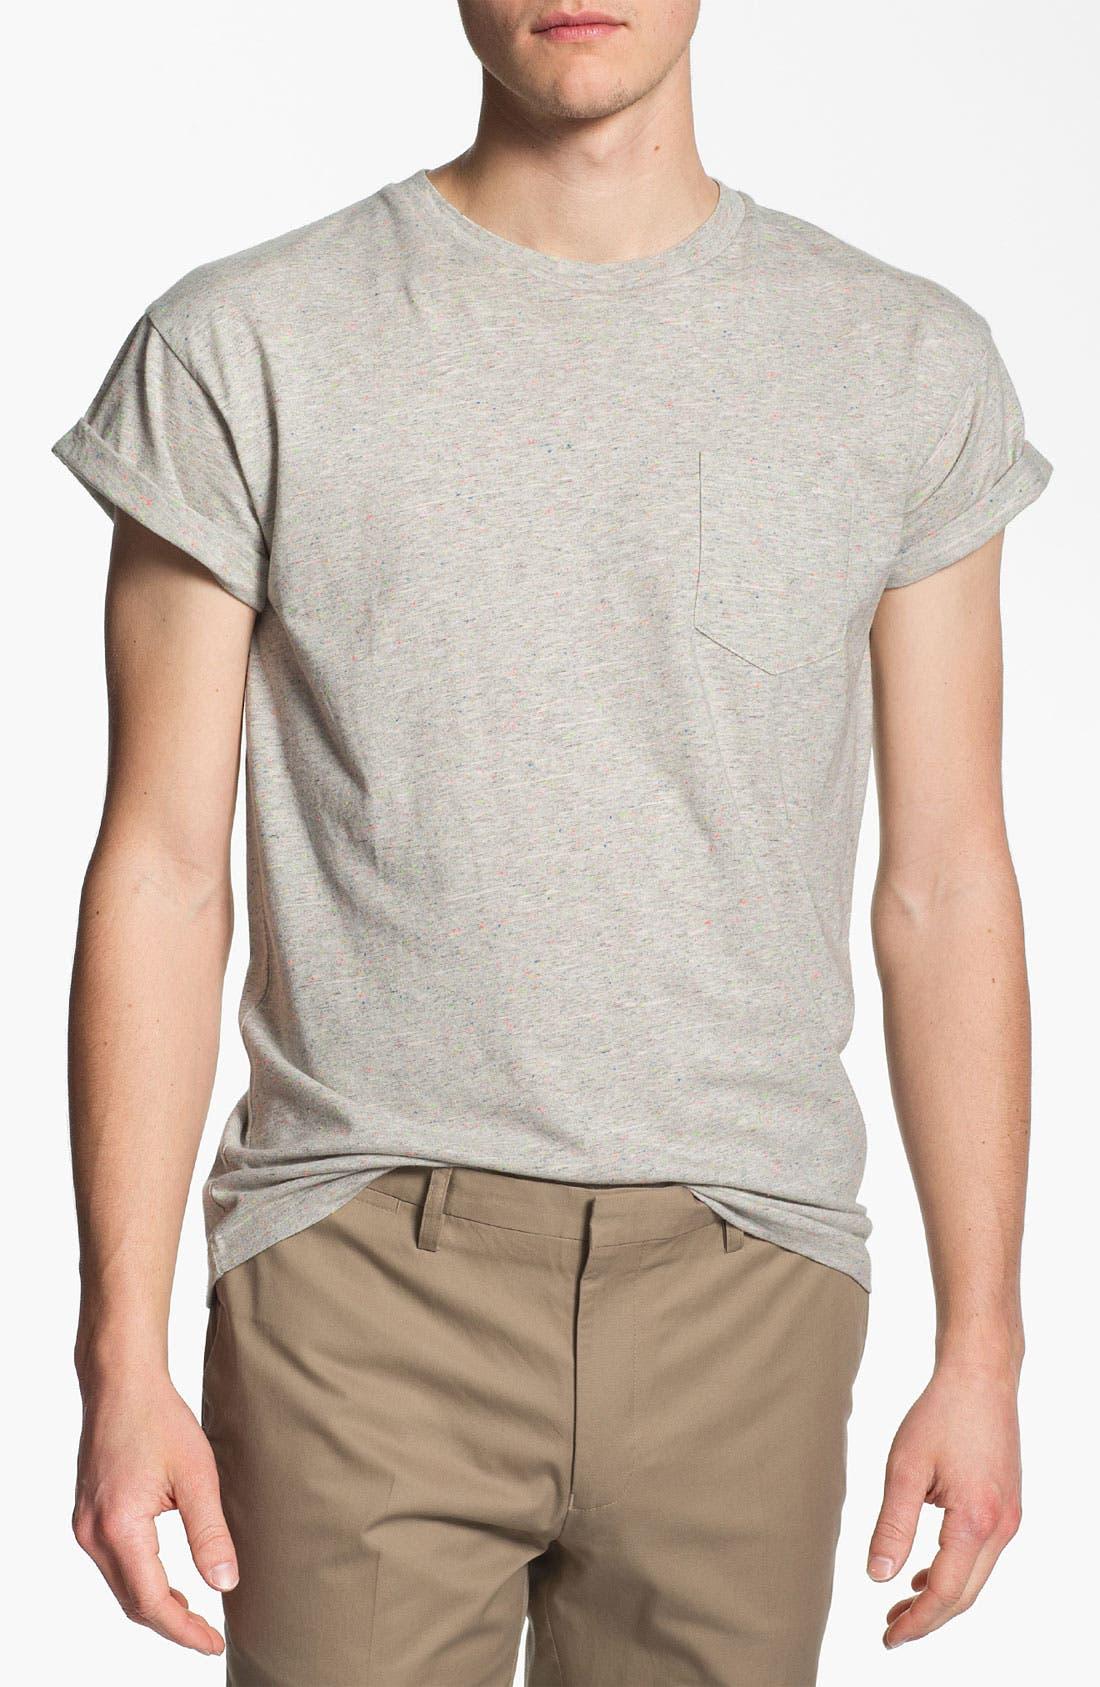 Alternate Image 1 Selected - Topman 'High Roller' Pocket T-Shirt